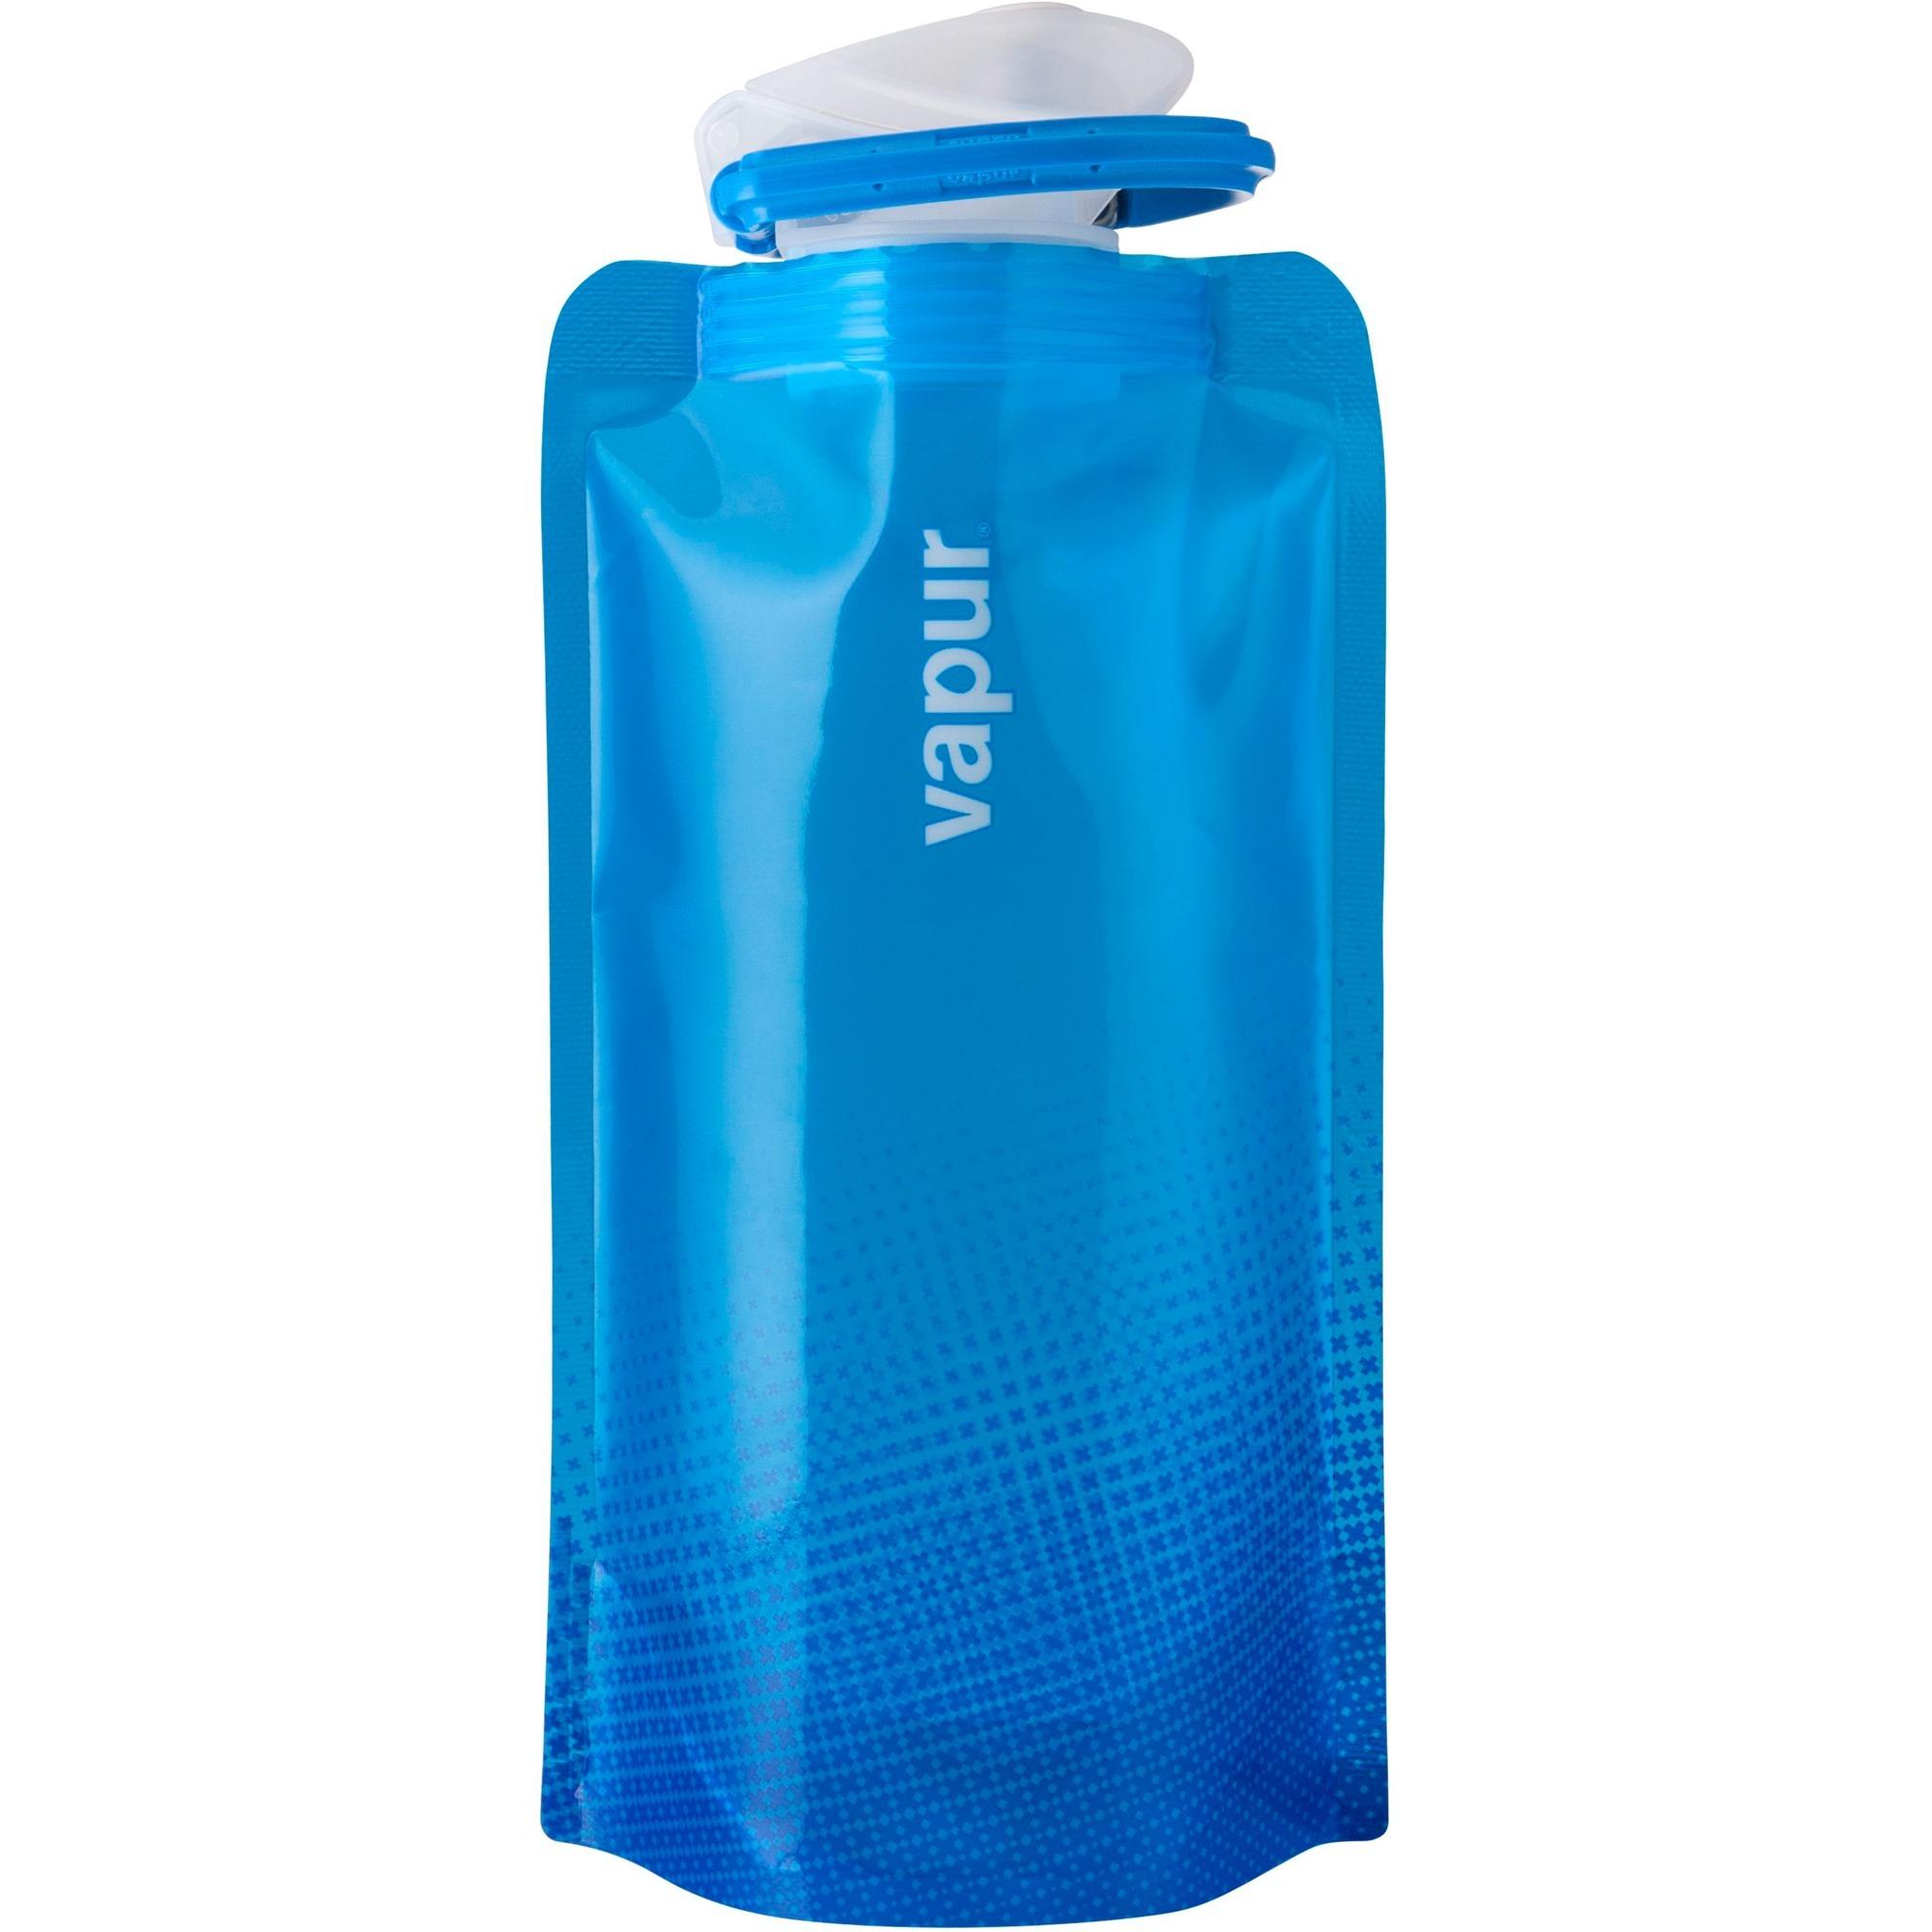 0,5 L Shades (cyan blue), Botella de agua